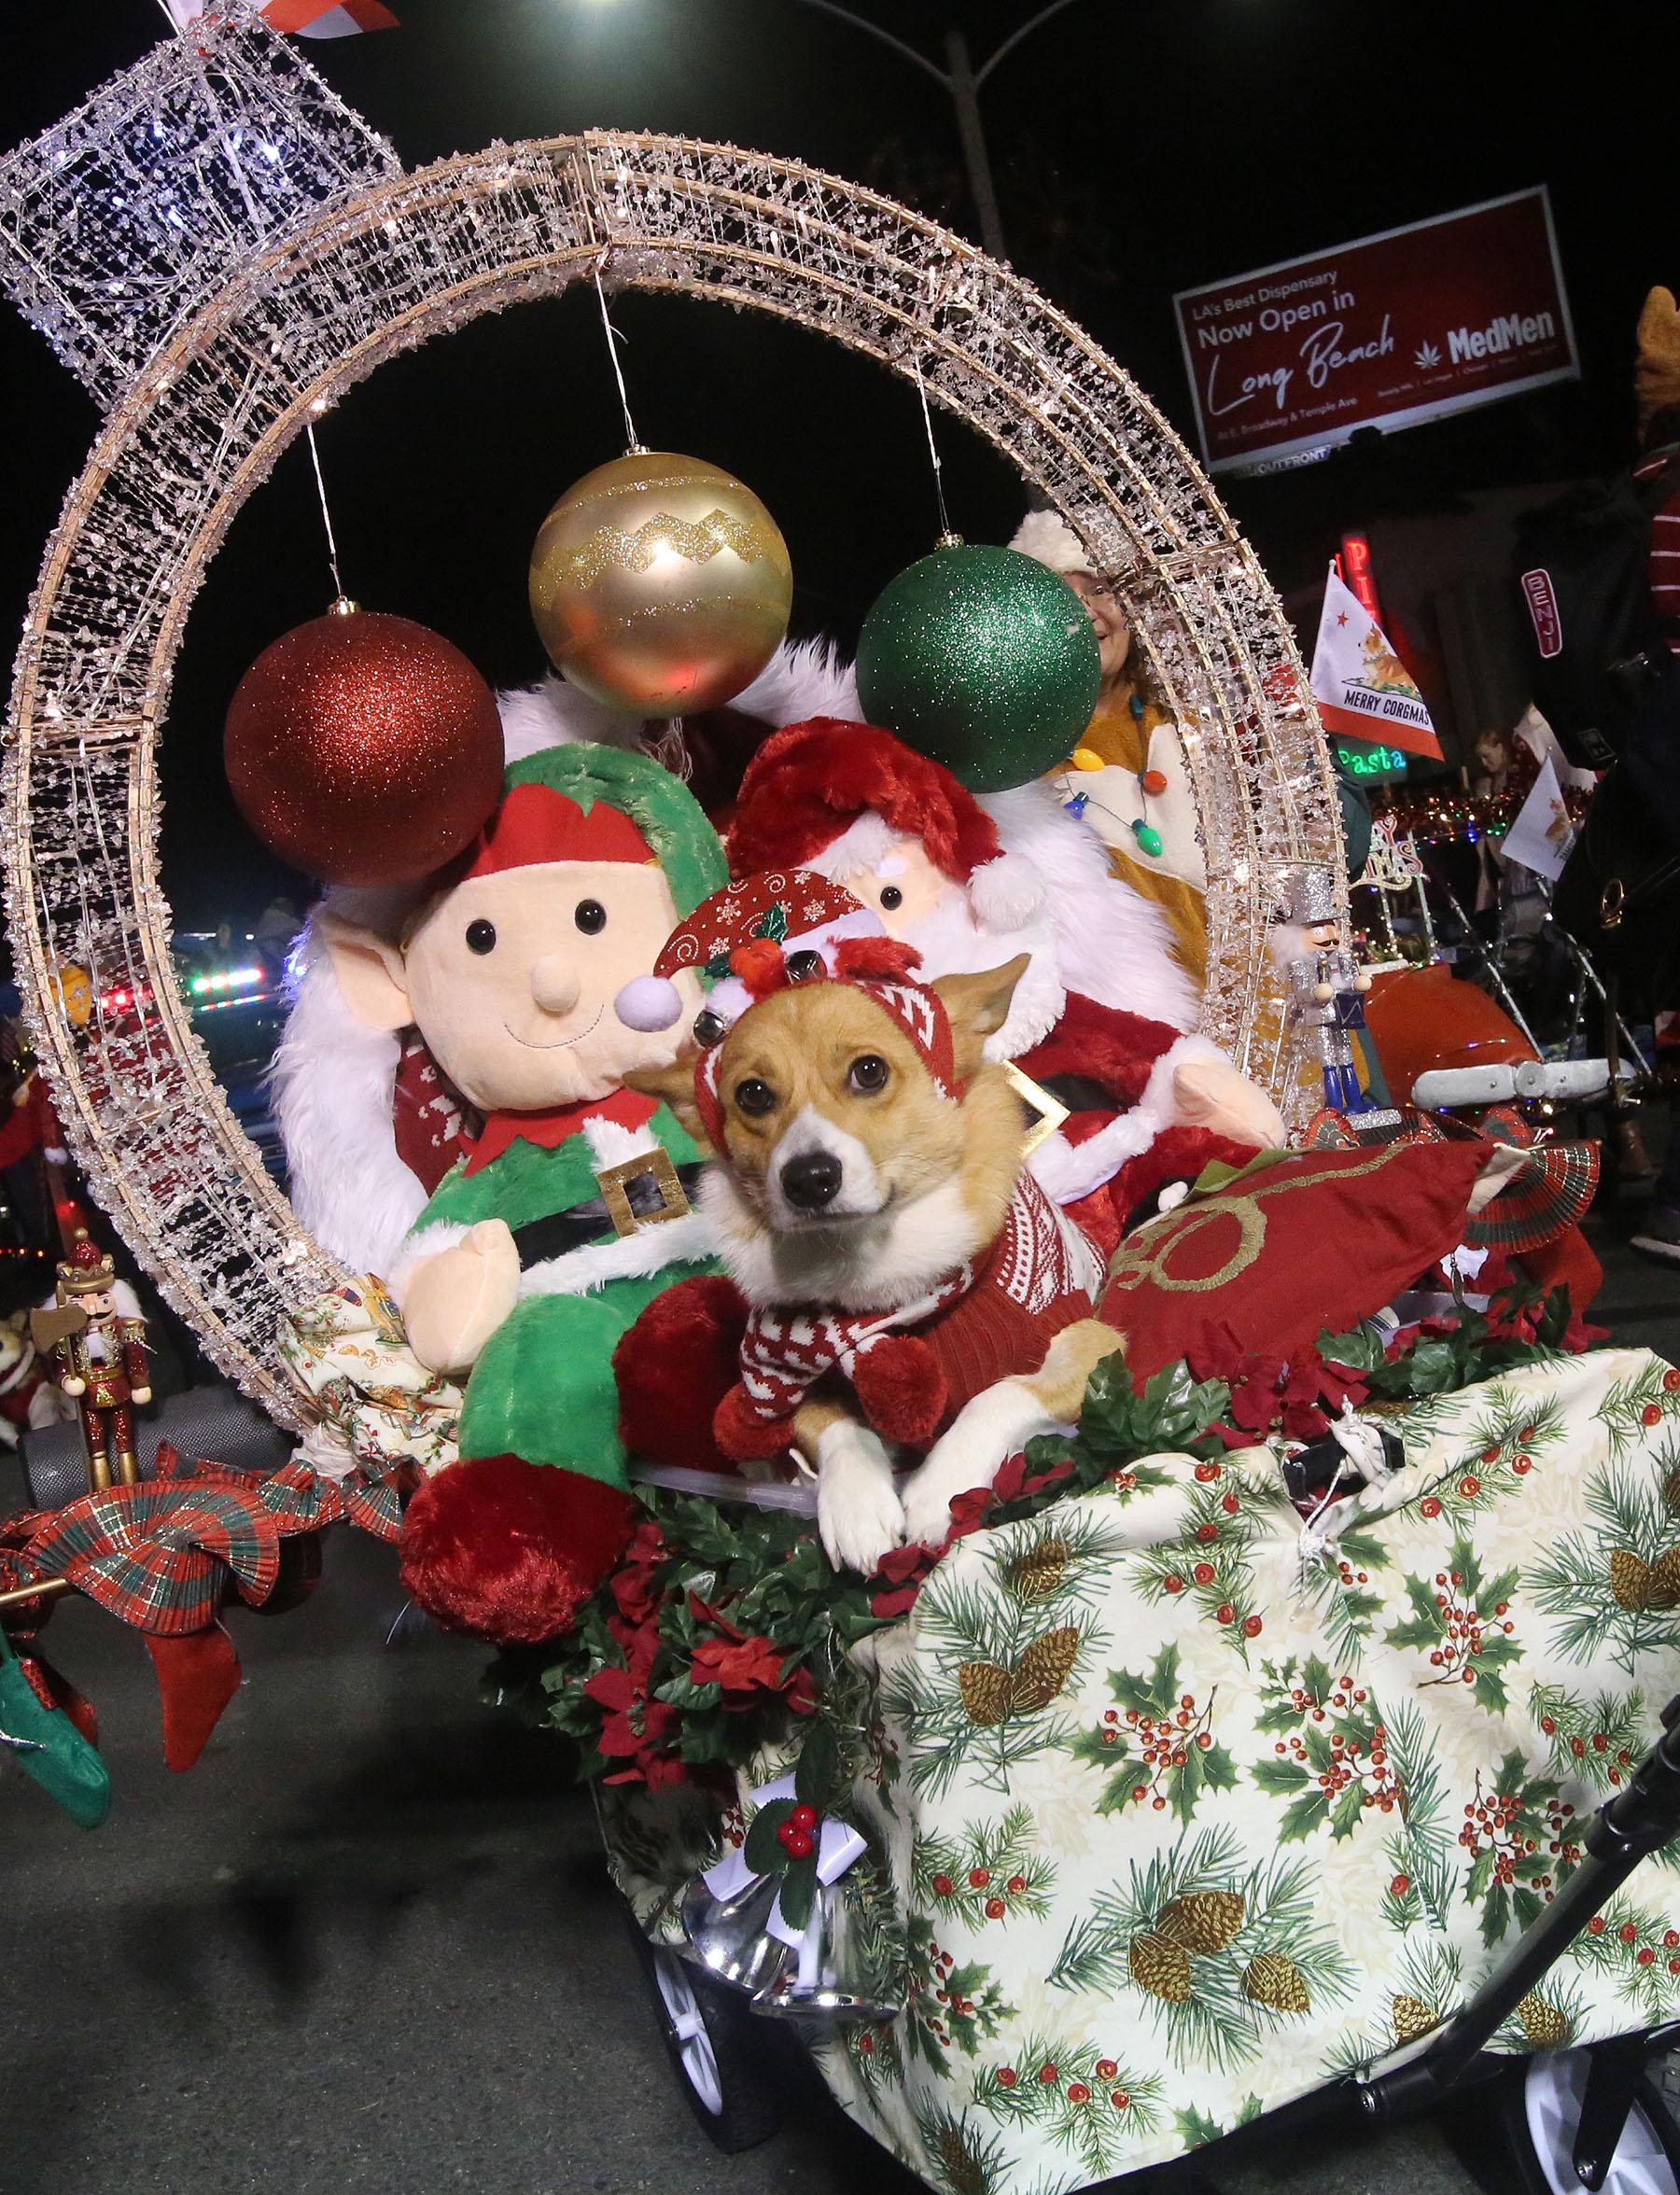 Belmont Shore Christmas Parade 2020 The Belmont Shore Christmas Parade is the latest COVID